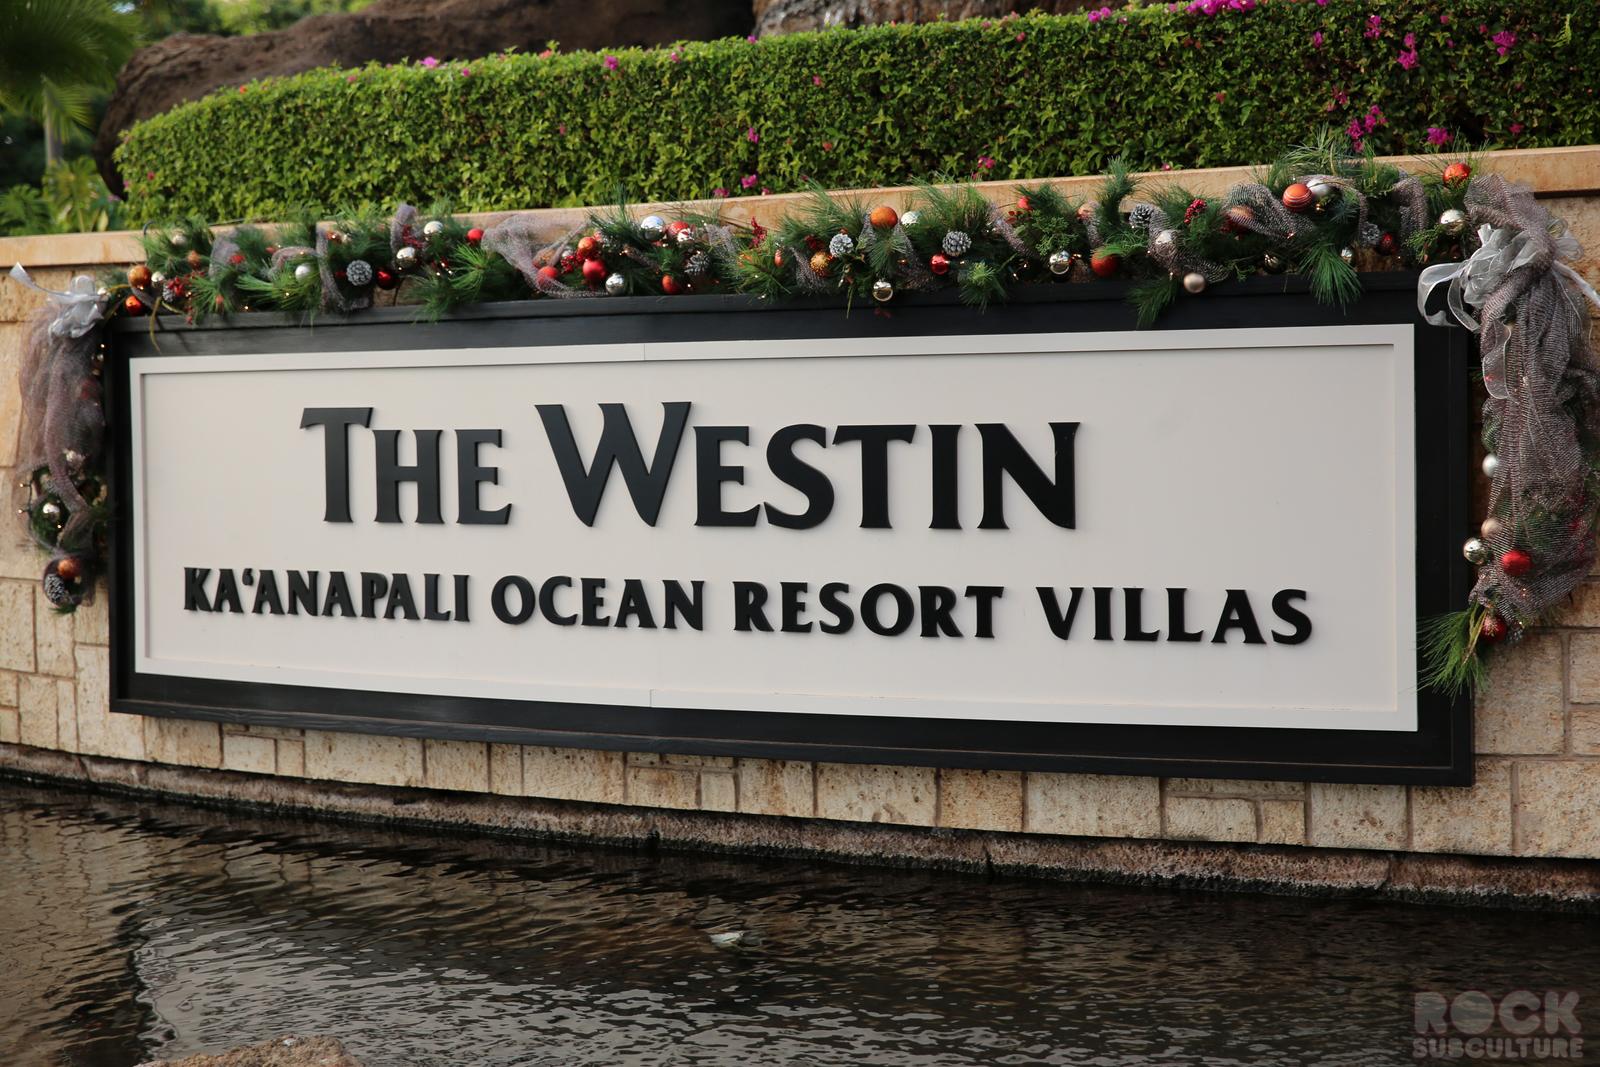 hotel/resort review: the westin ka'anapali ocean resort villas